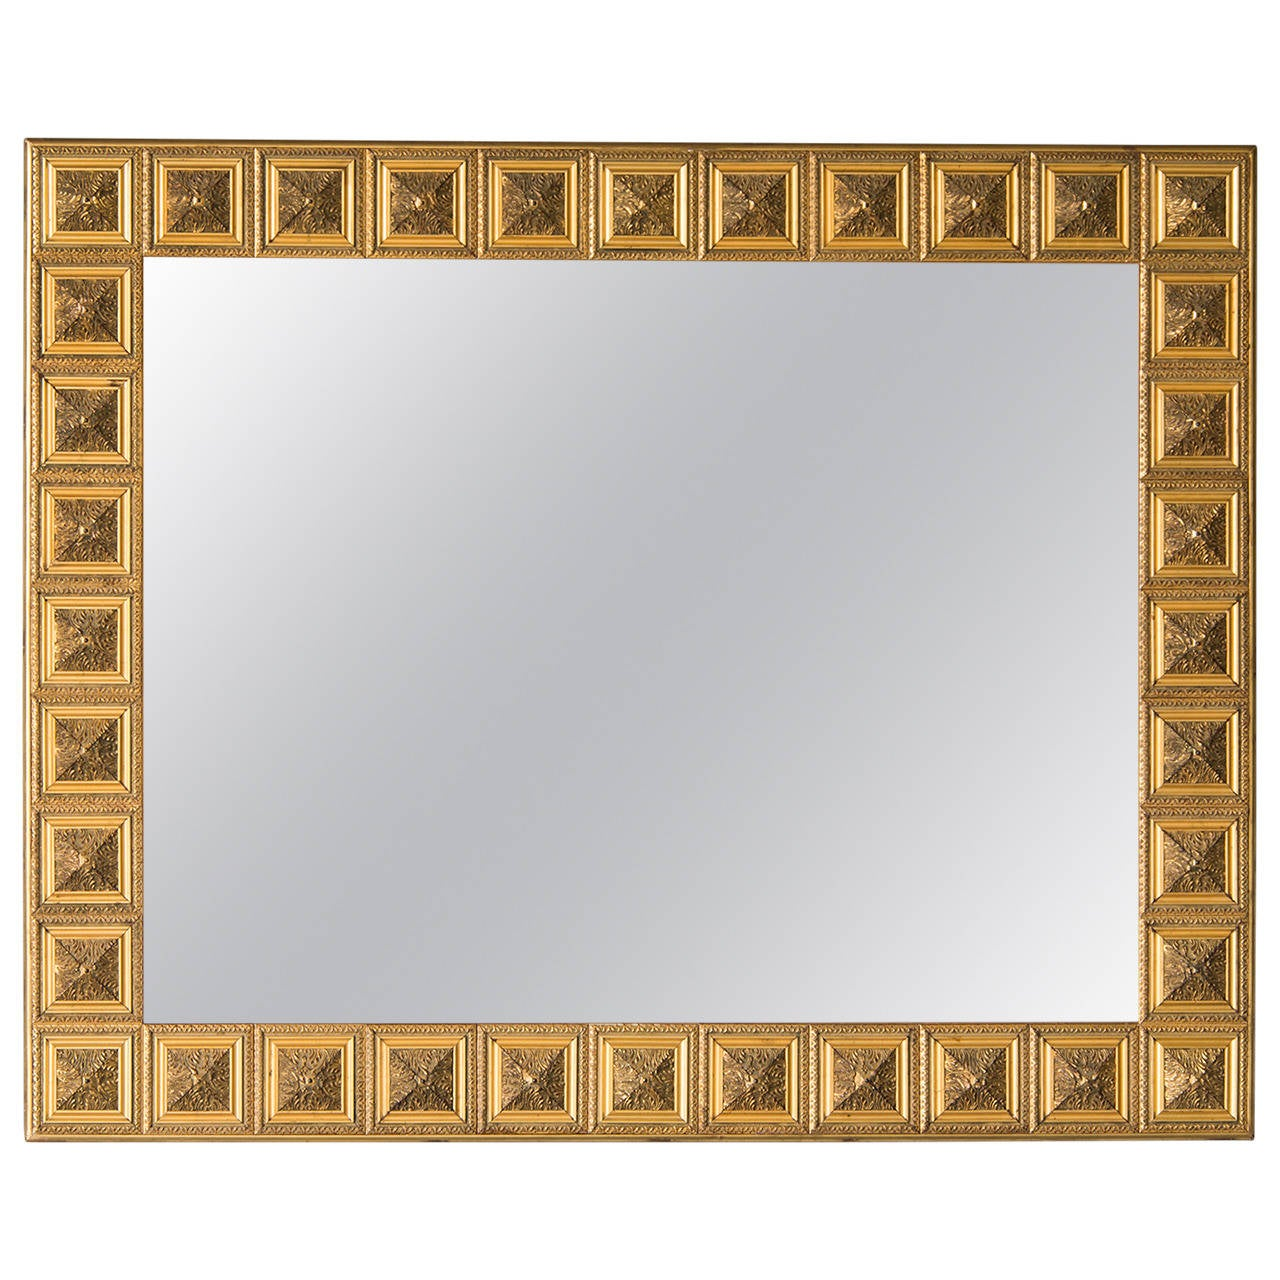 Vintage Italian Square Medallion Giltwood Mirror, circa 1920